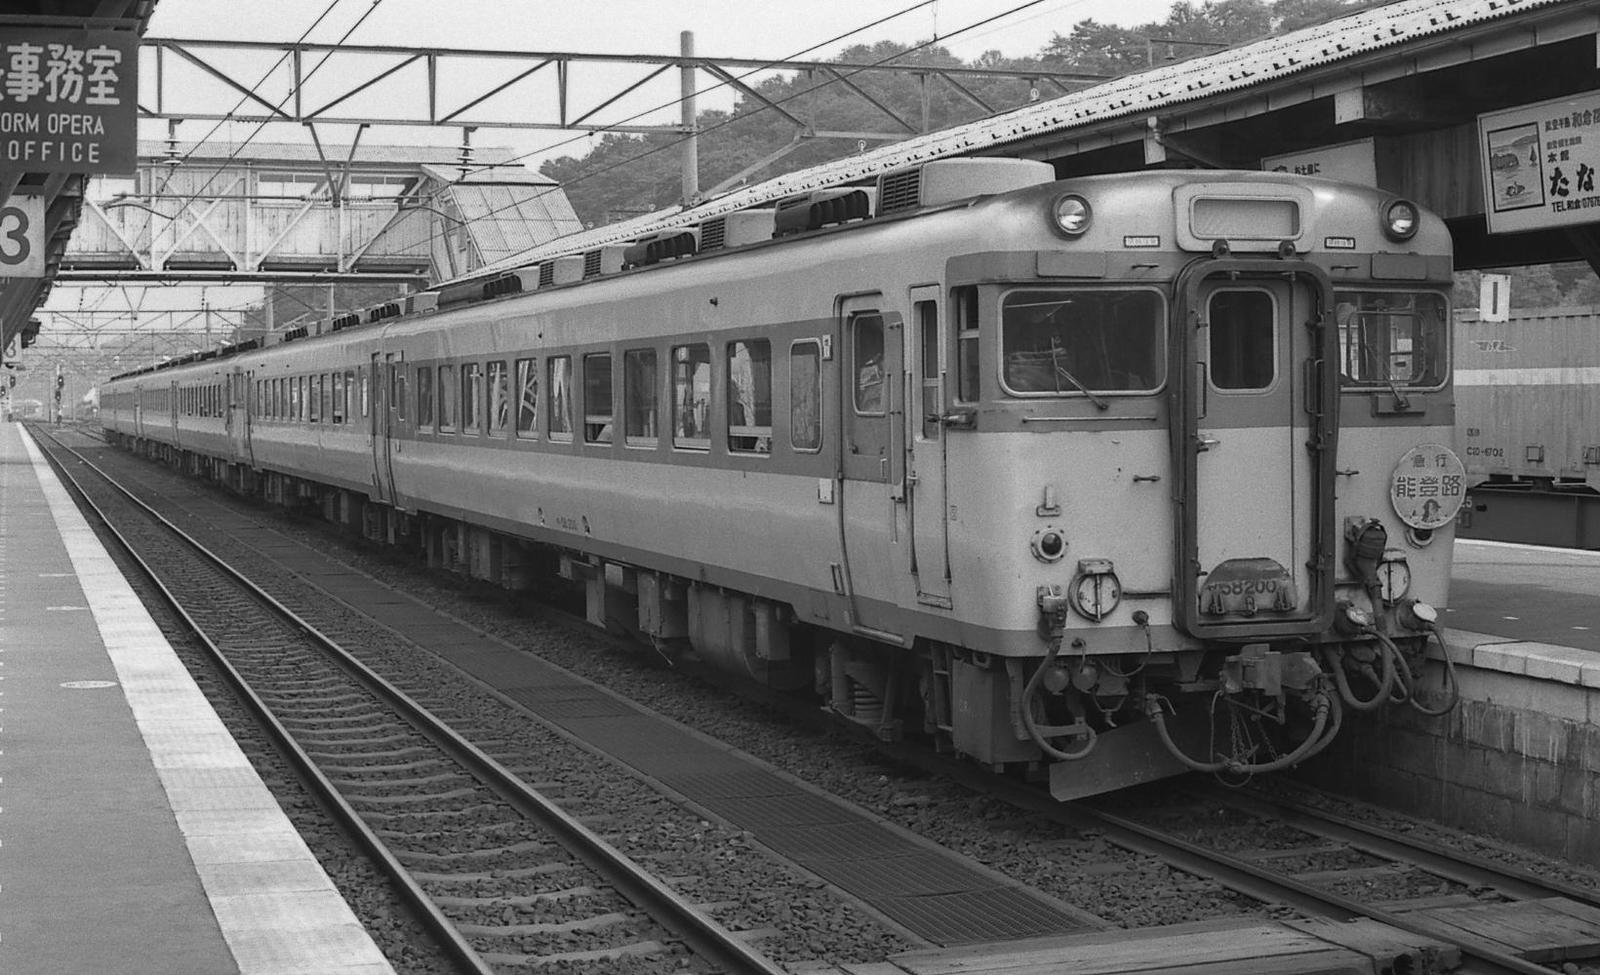 19791003c01